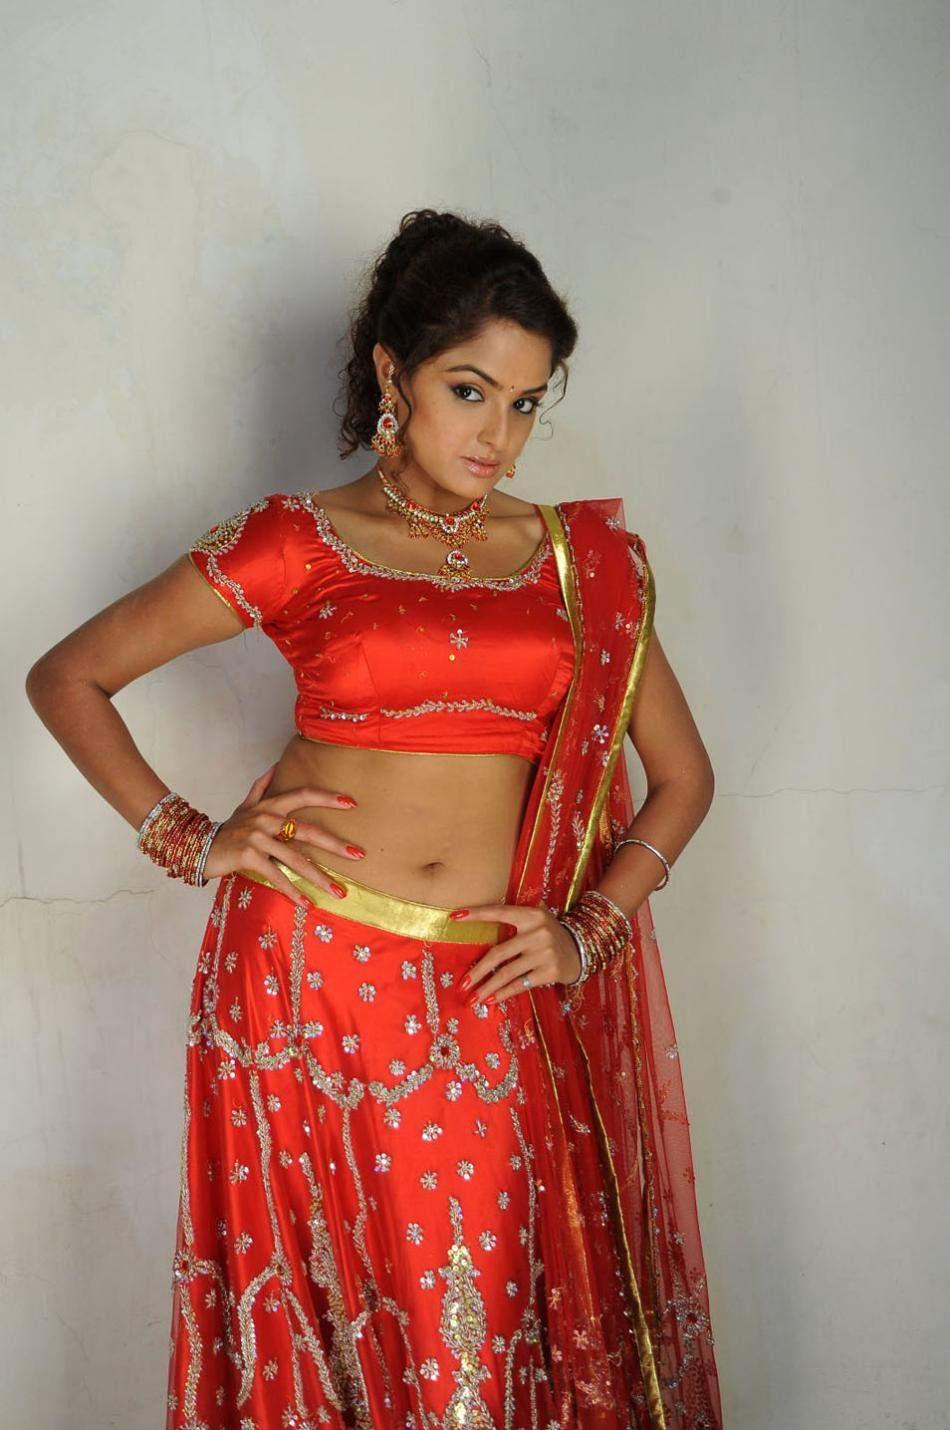 ACTRESS HOT IMAGES: Asmita sood hot milky thighs hot on bed,bikini image gallery